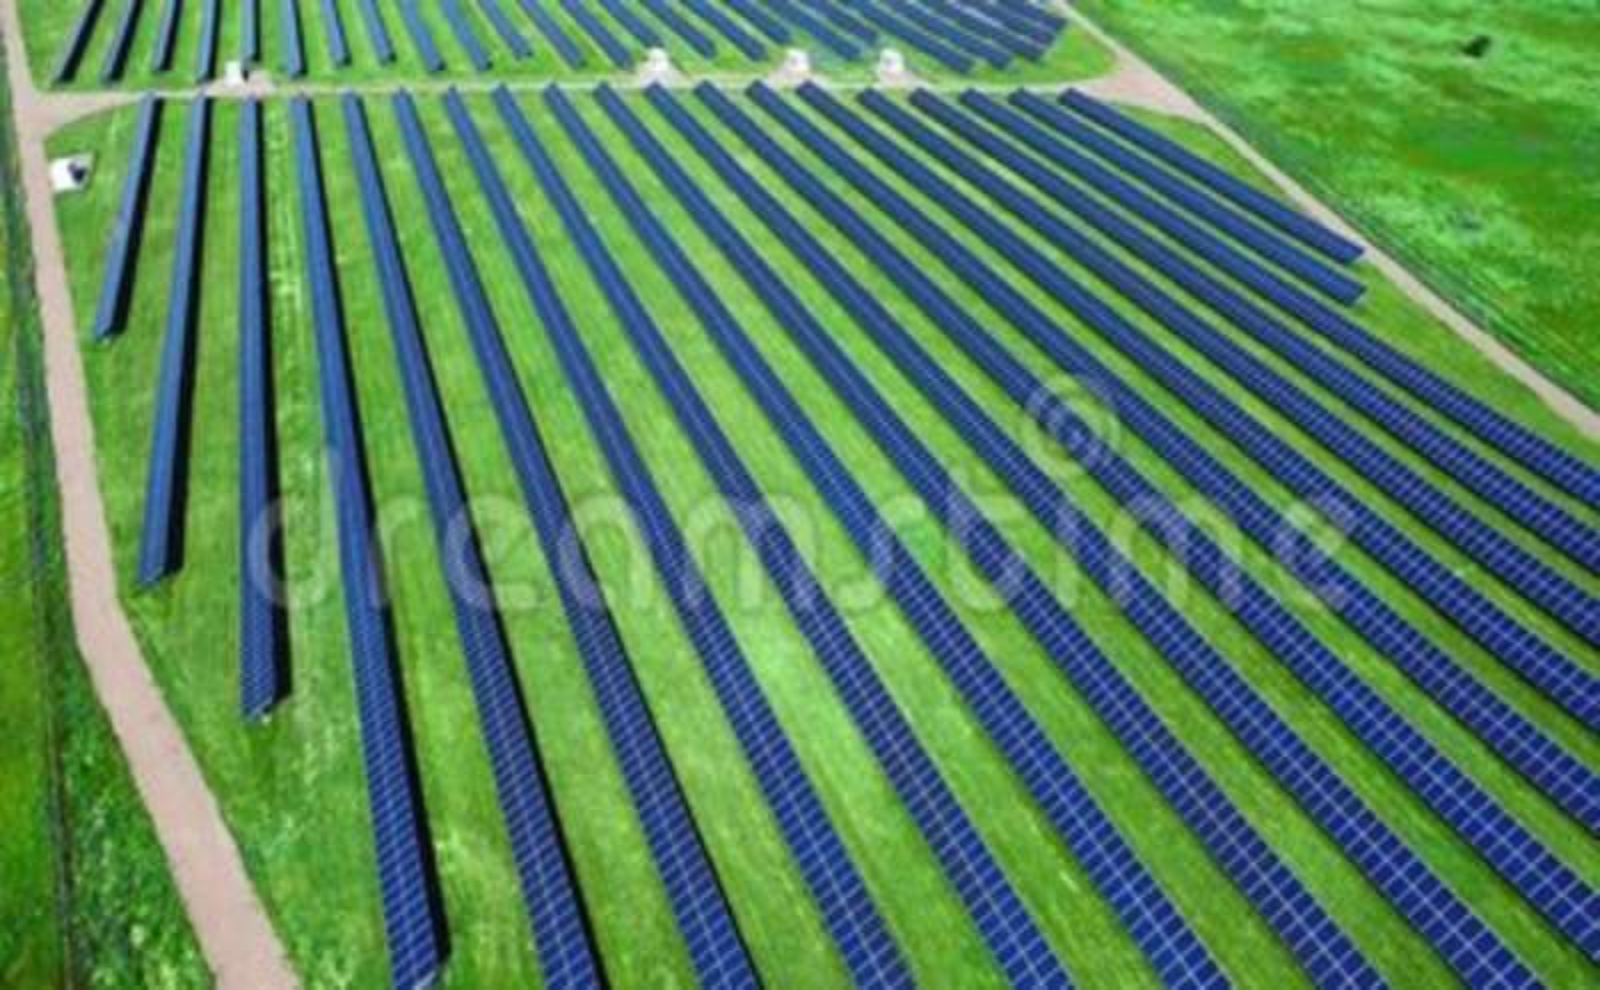 Environmentally friendly green energy farm. Modern solar power plant. Generation equipment. Aerial drone view on photovoltaic panels. Alternative green energy stock footage